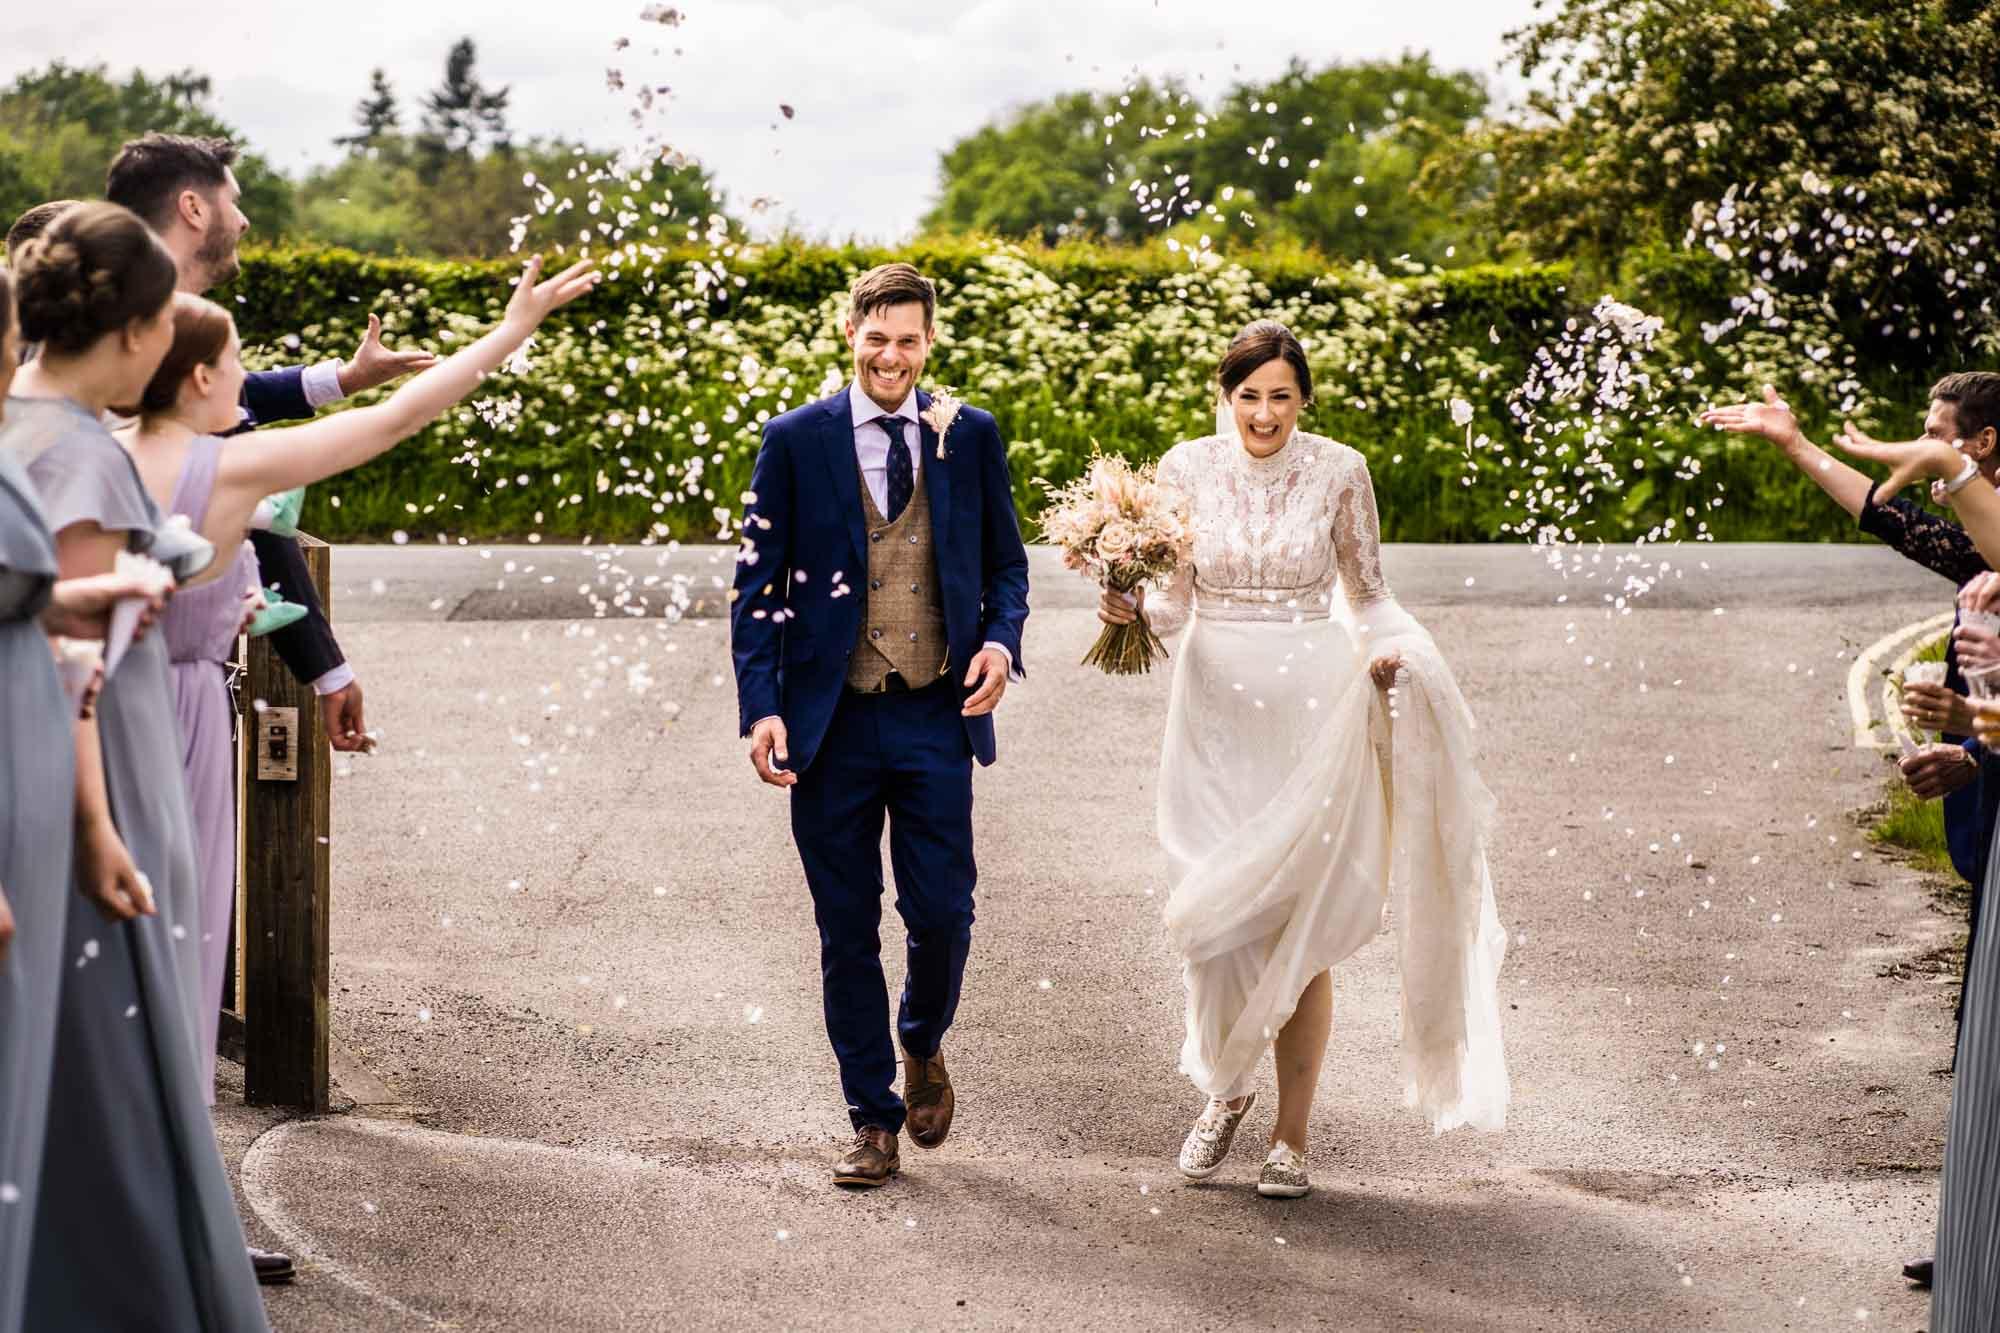 Wedding Photography Dunham Massey Village Hall